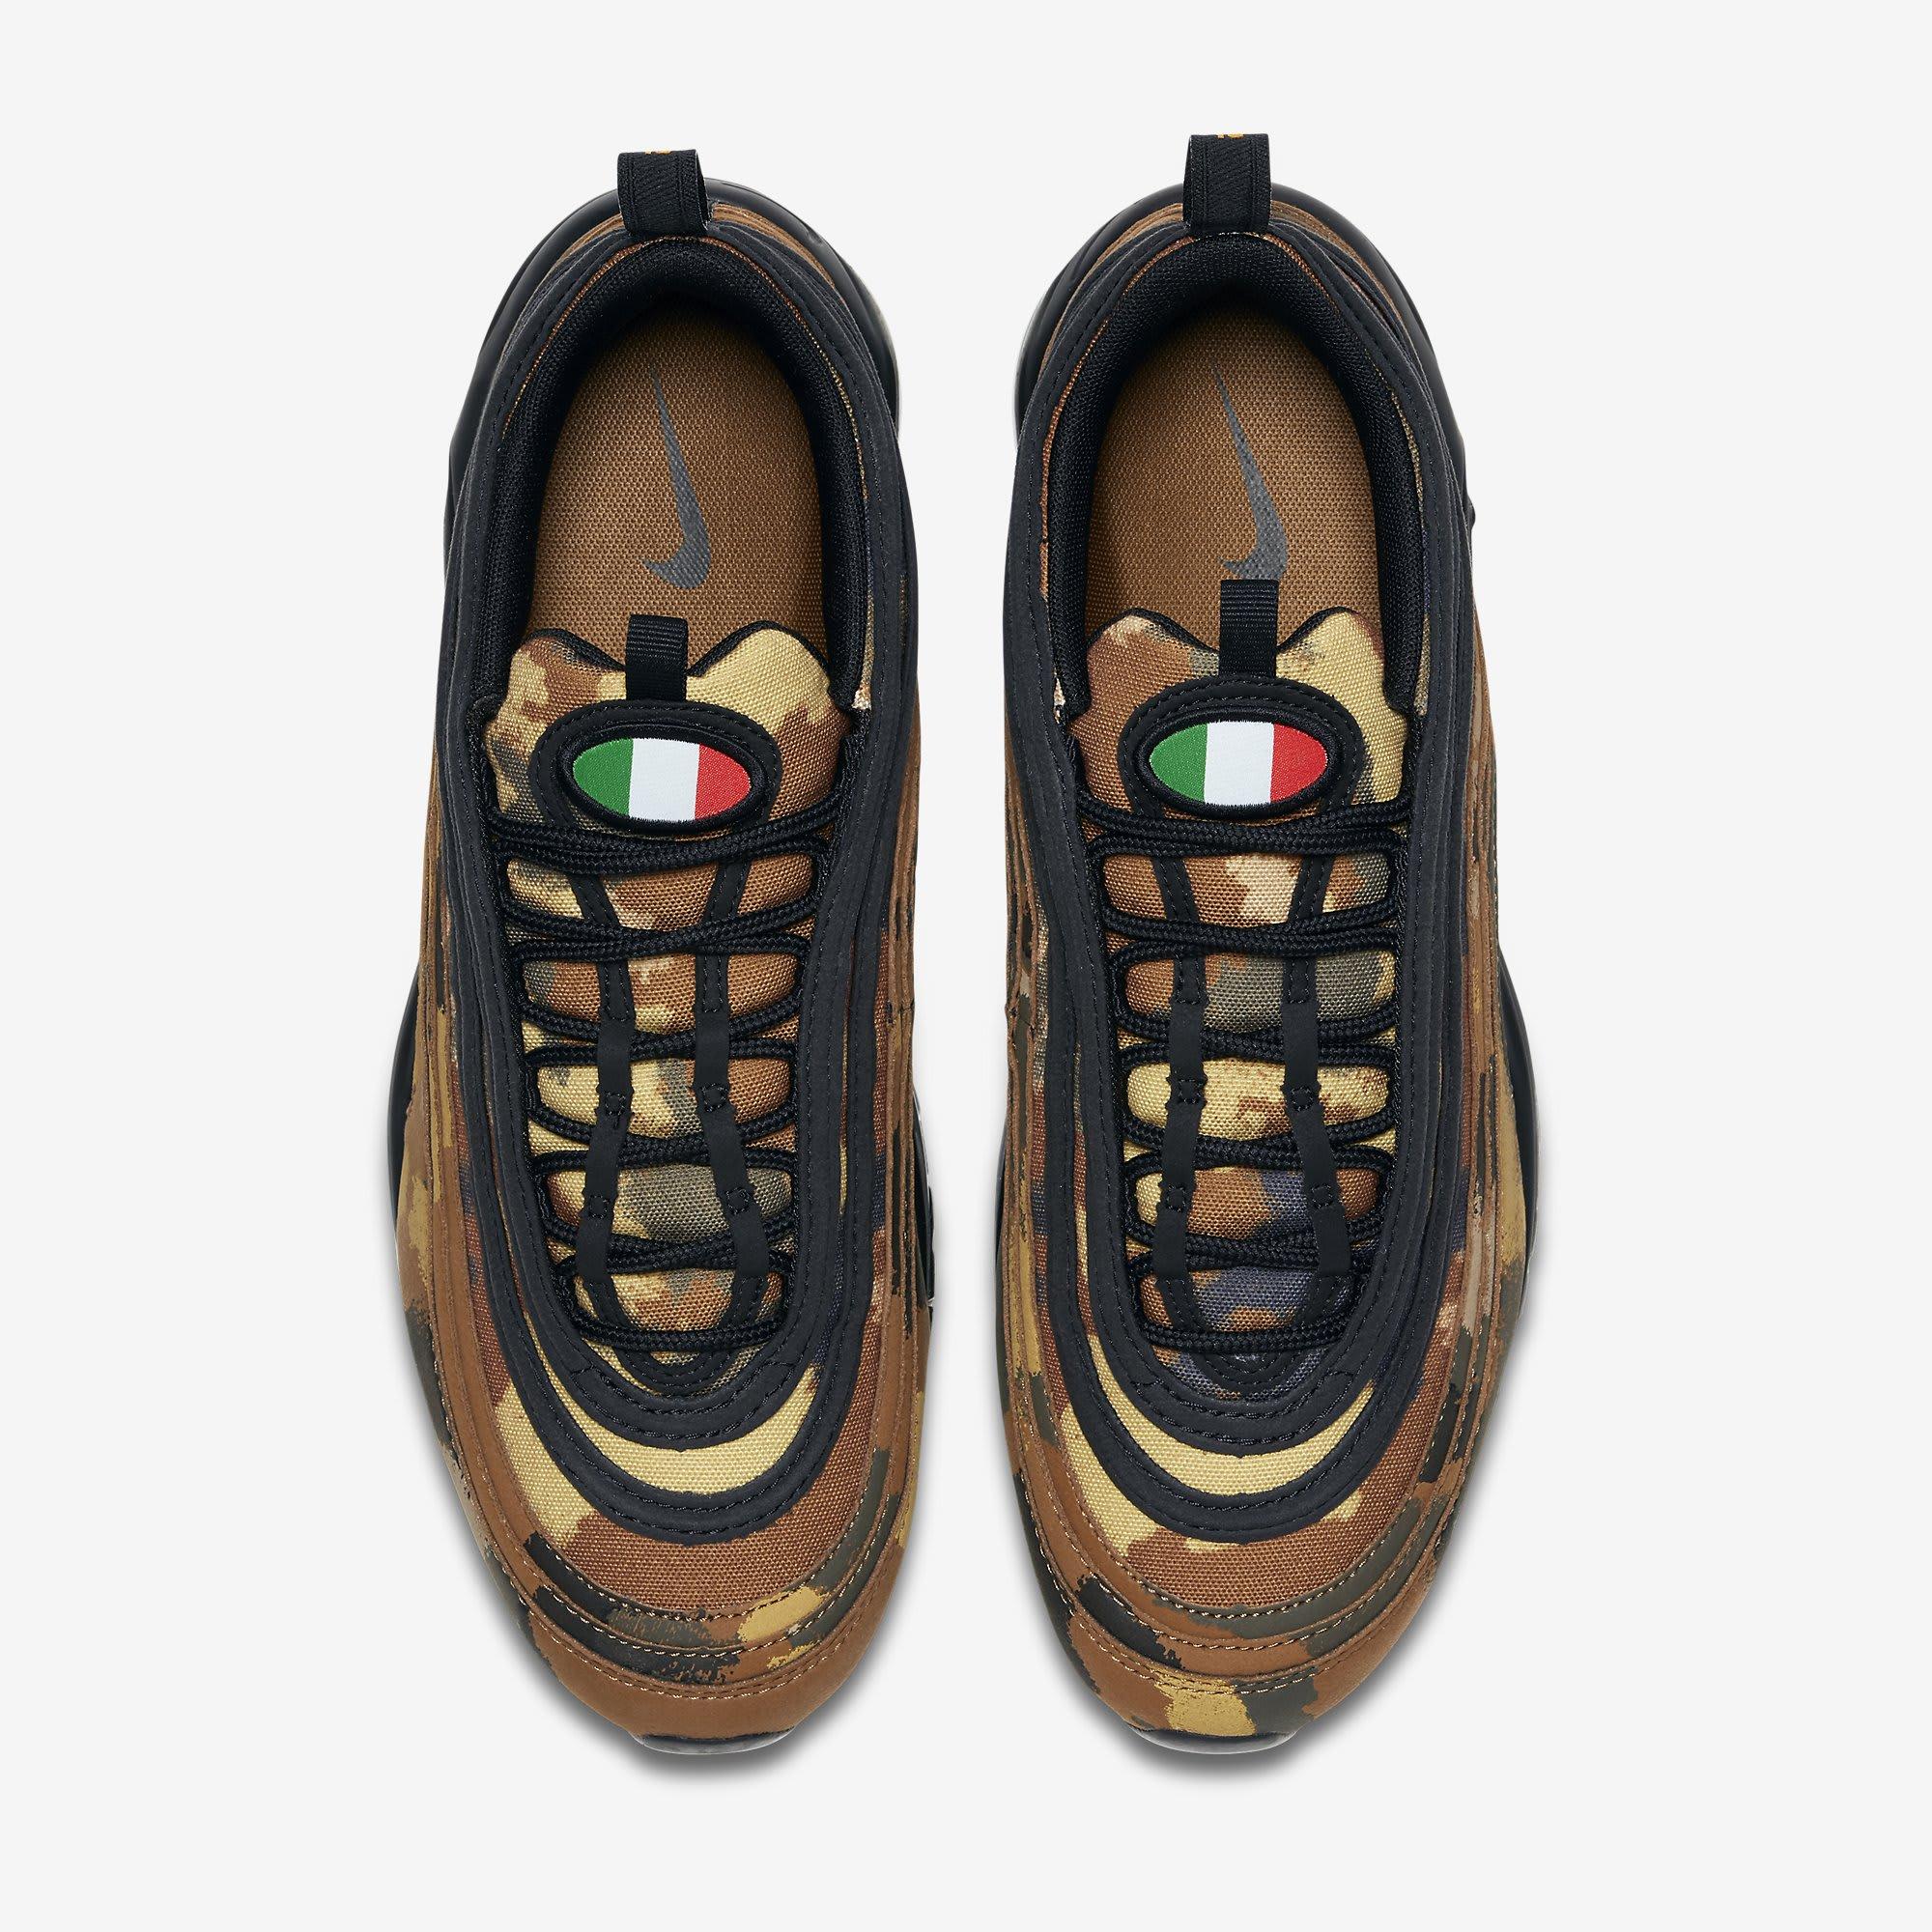 Nike Air Max 97 'Country Camo' Italy AJ2614-202 (Top)